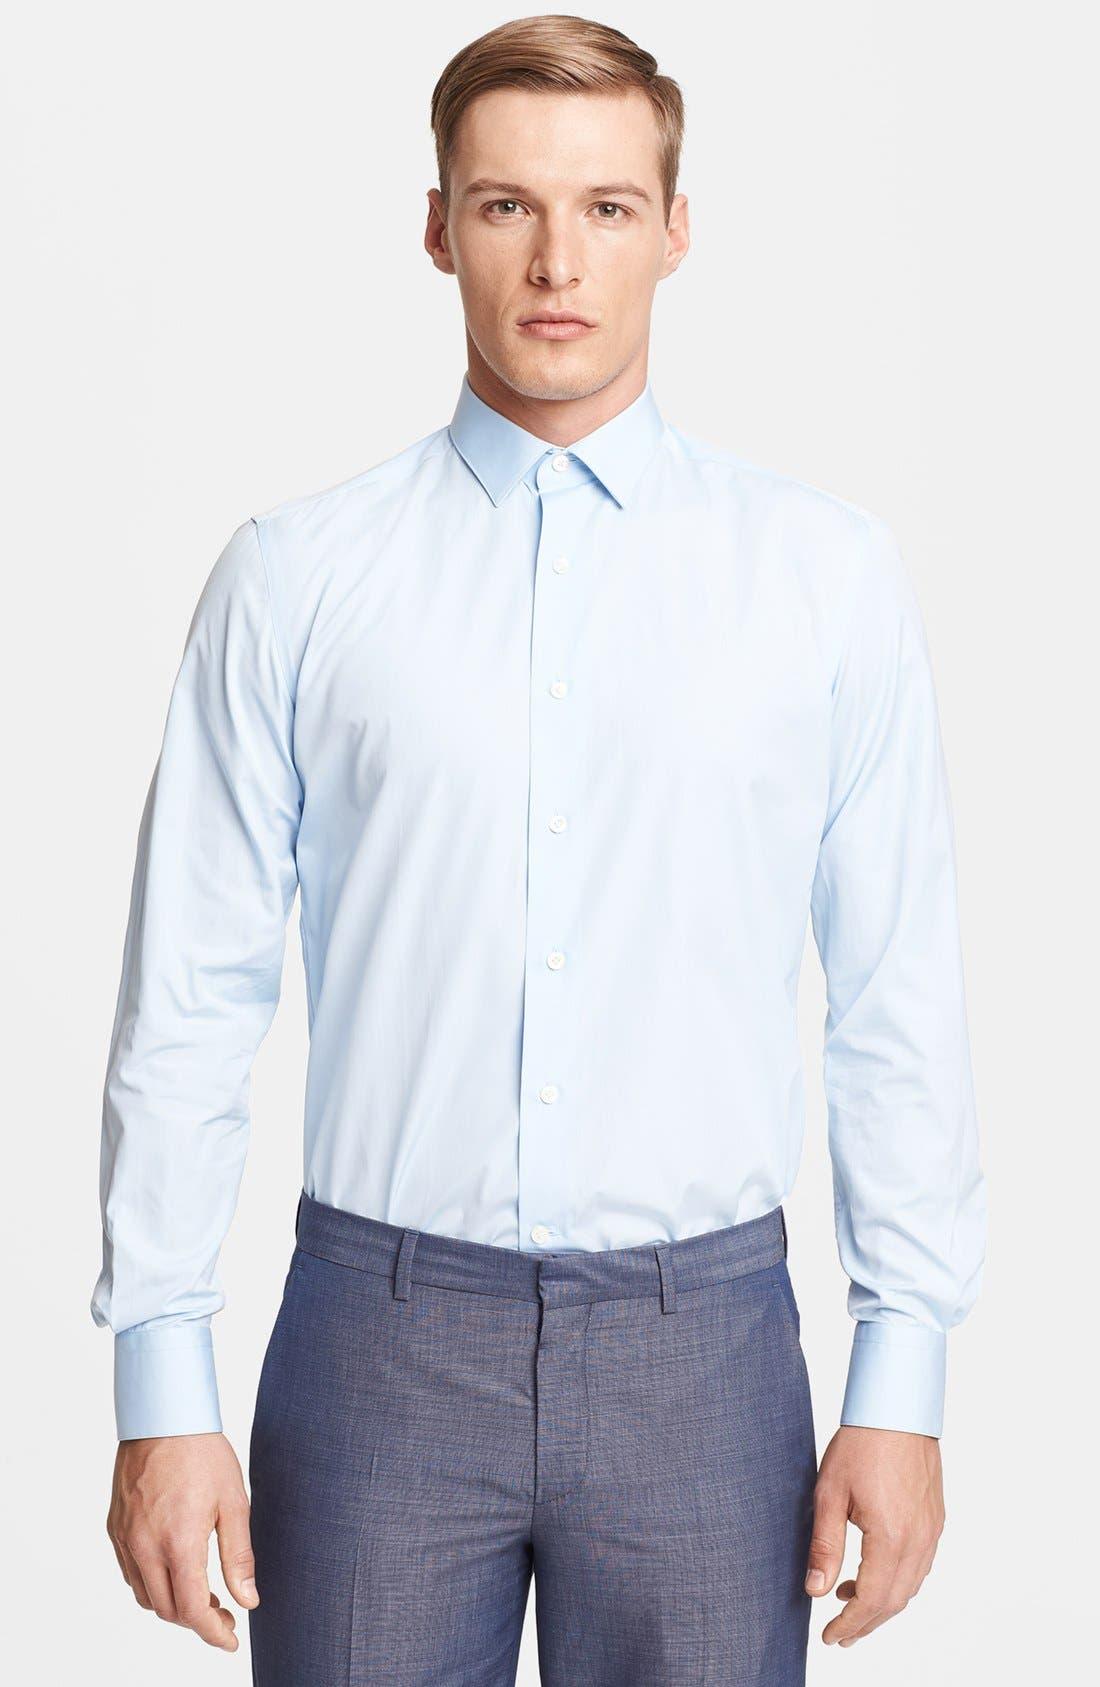 Main Image - Lanvin Slim Fit Poplin Dress Shirt